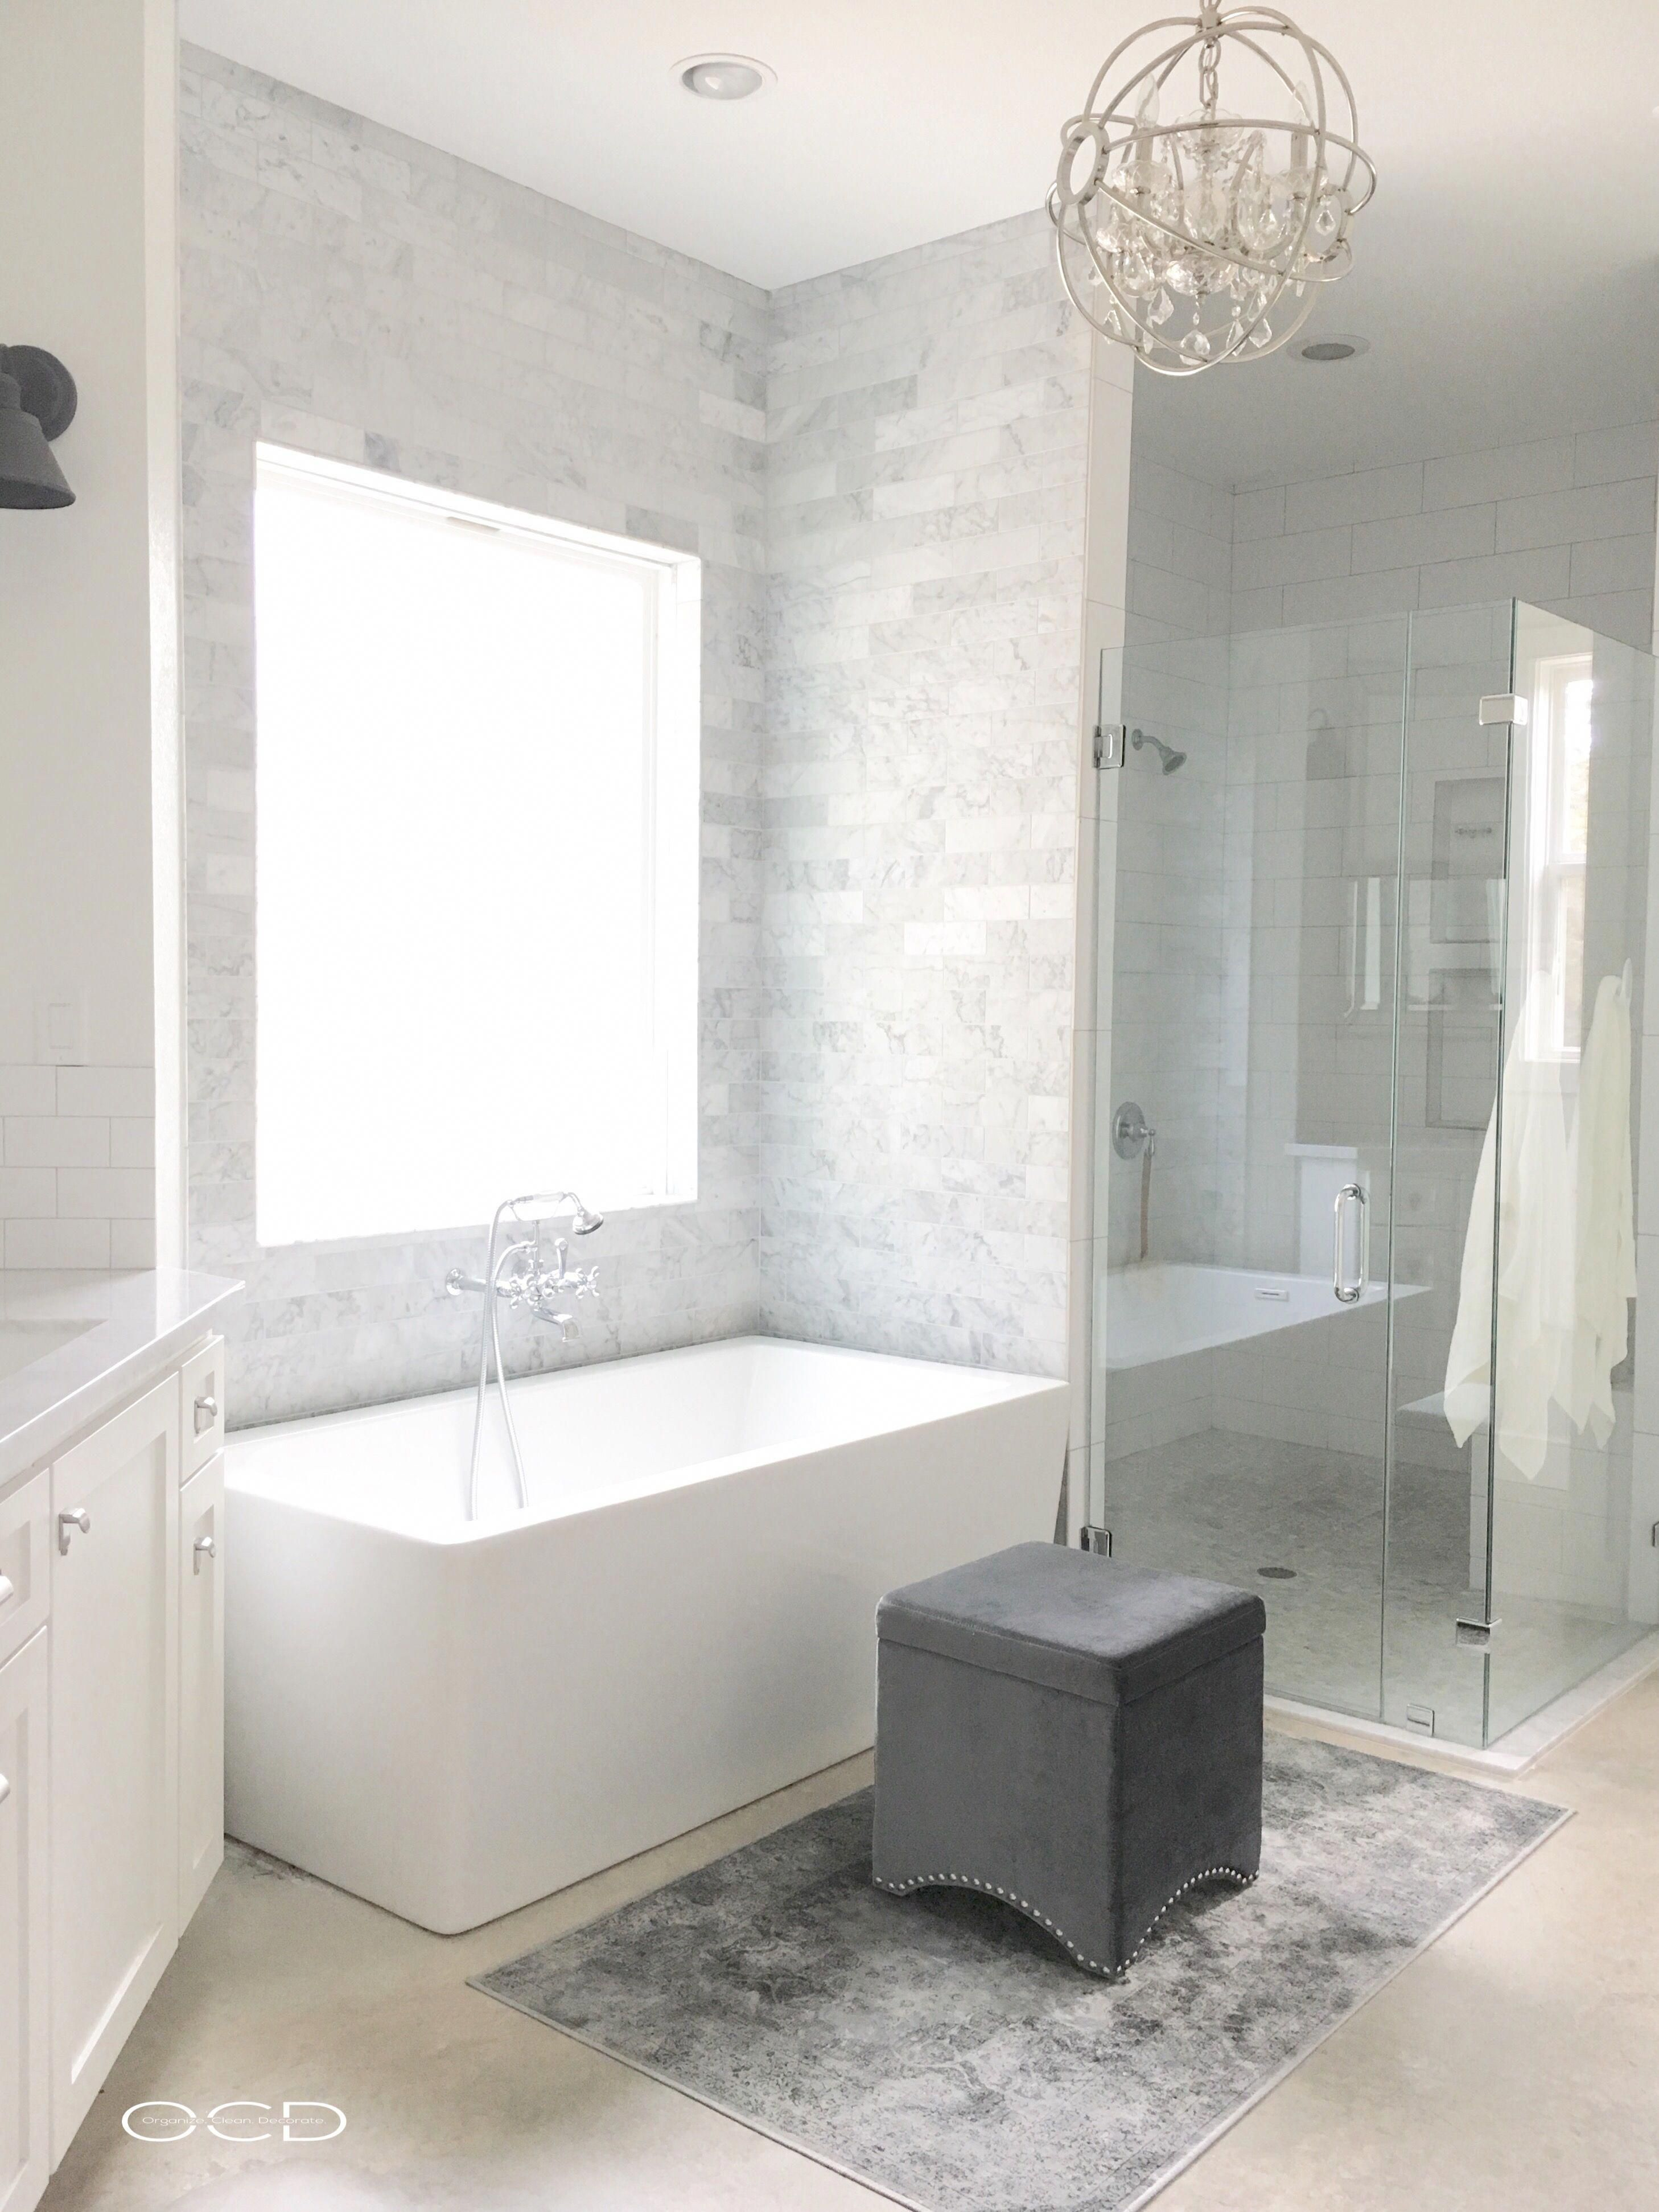 Bathroom Tour And Resources Organize Clean Decorate Bathroom Freestanding Modern Tub Luxury Bathroom